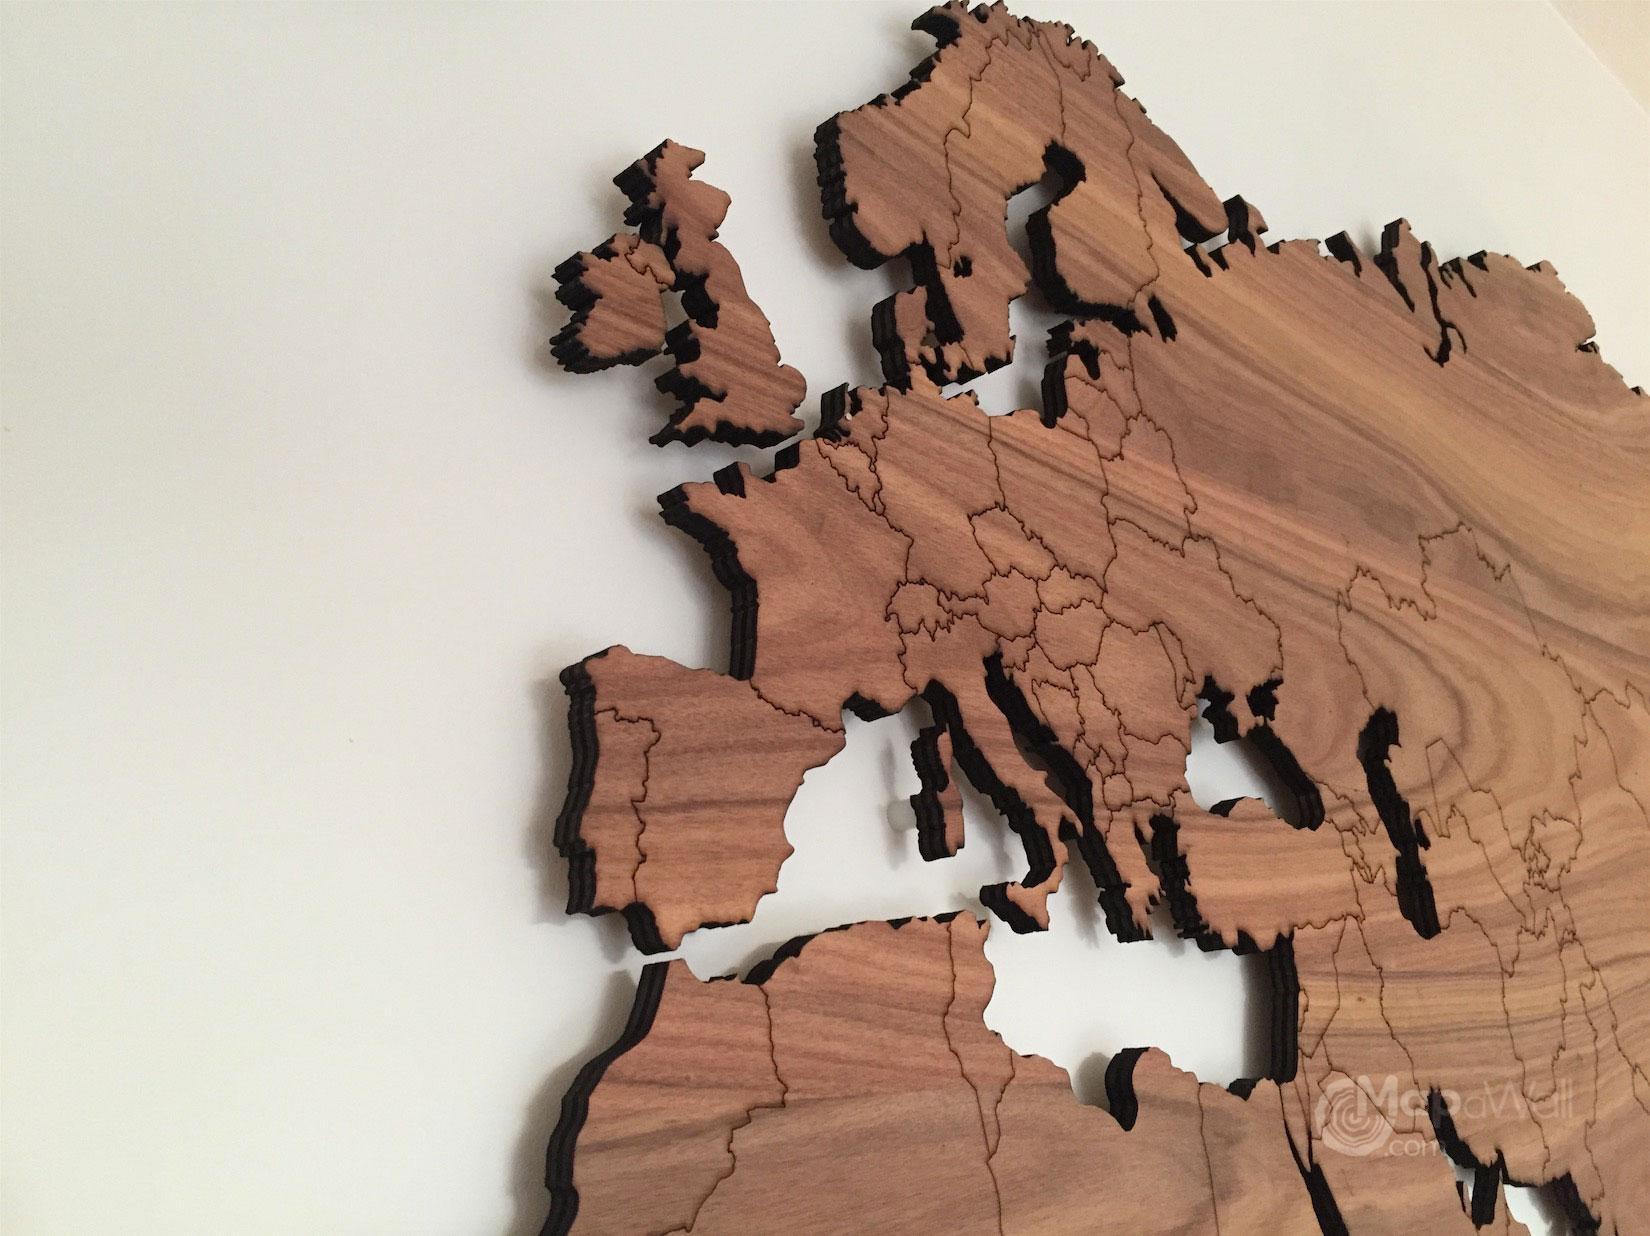 Mapawall Wooden World Map Palisander – Mapawall Throughout Wooden World Map Wall Art (View 2 of 20)